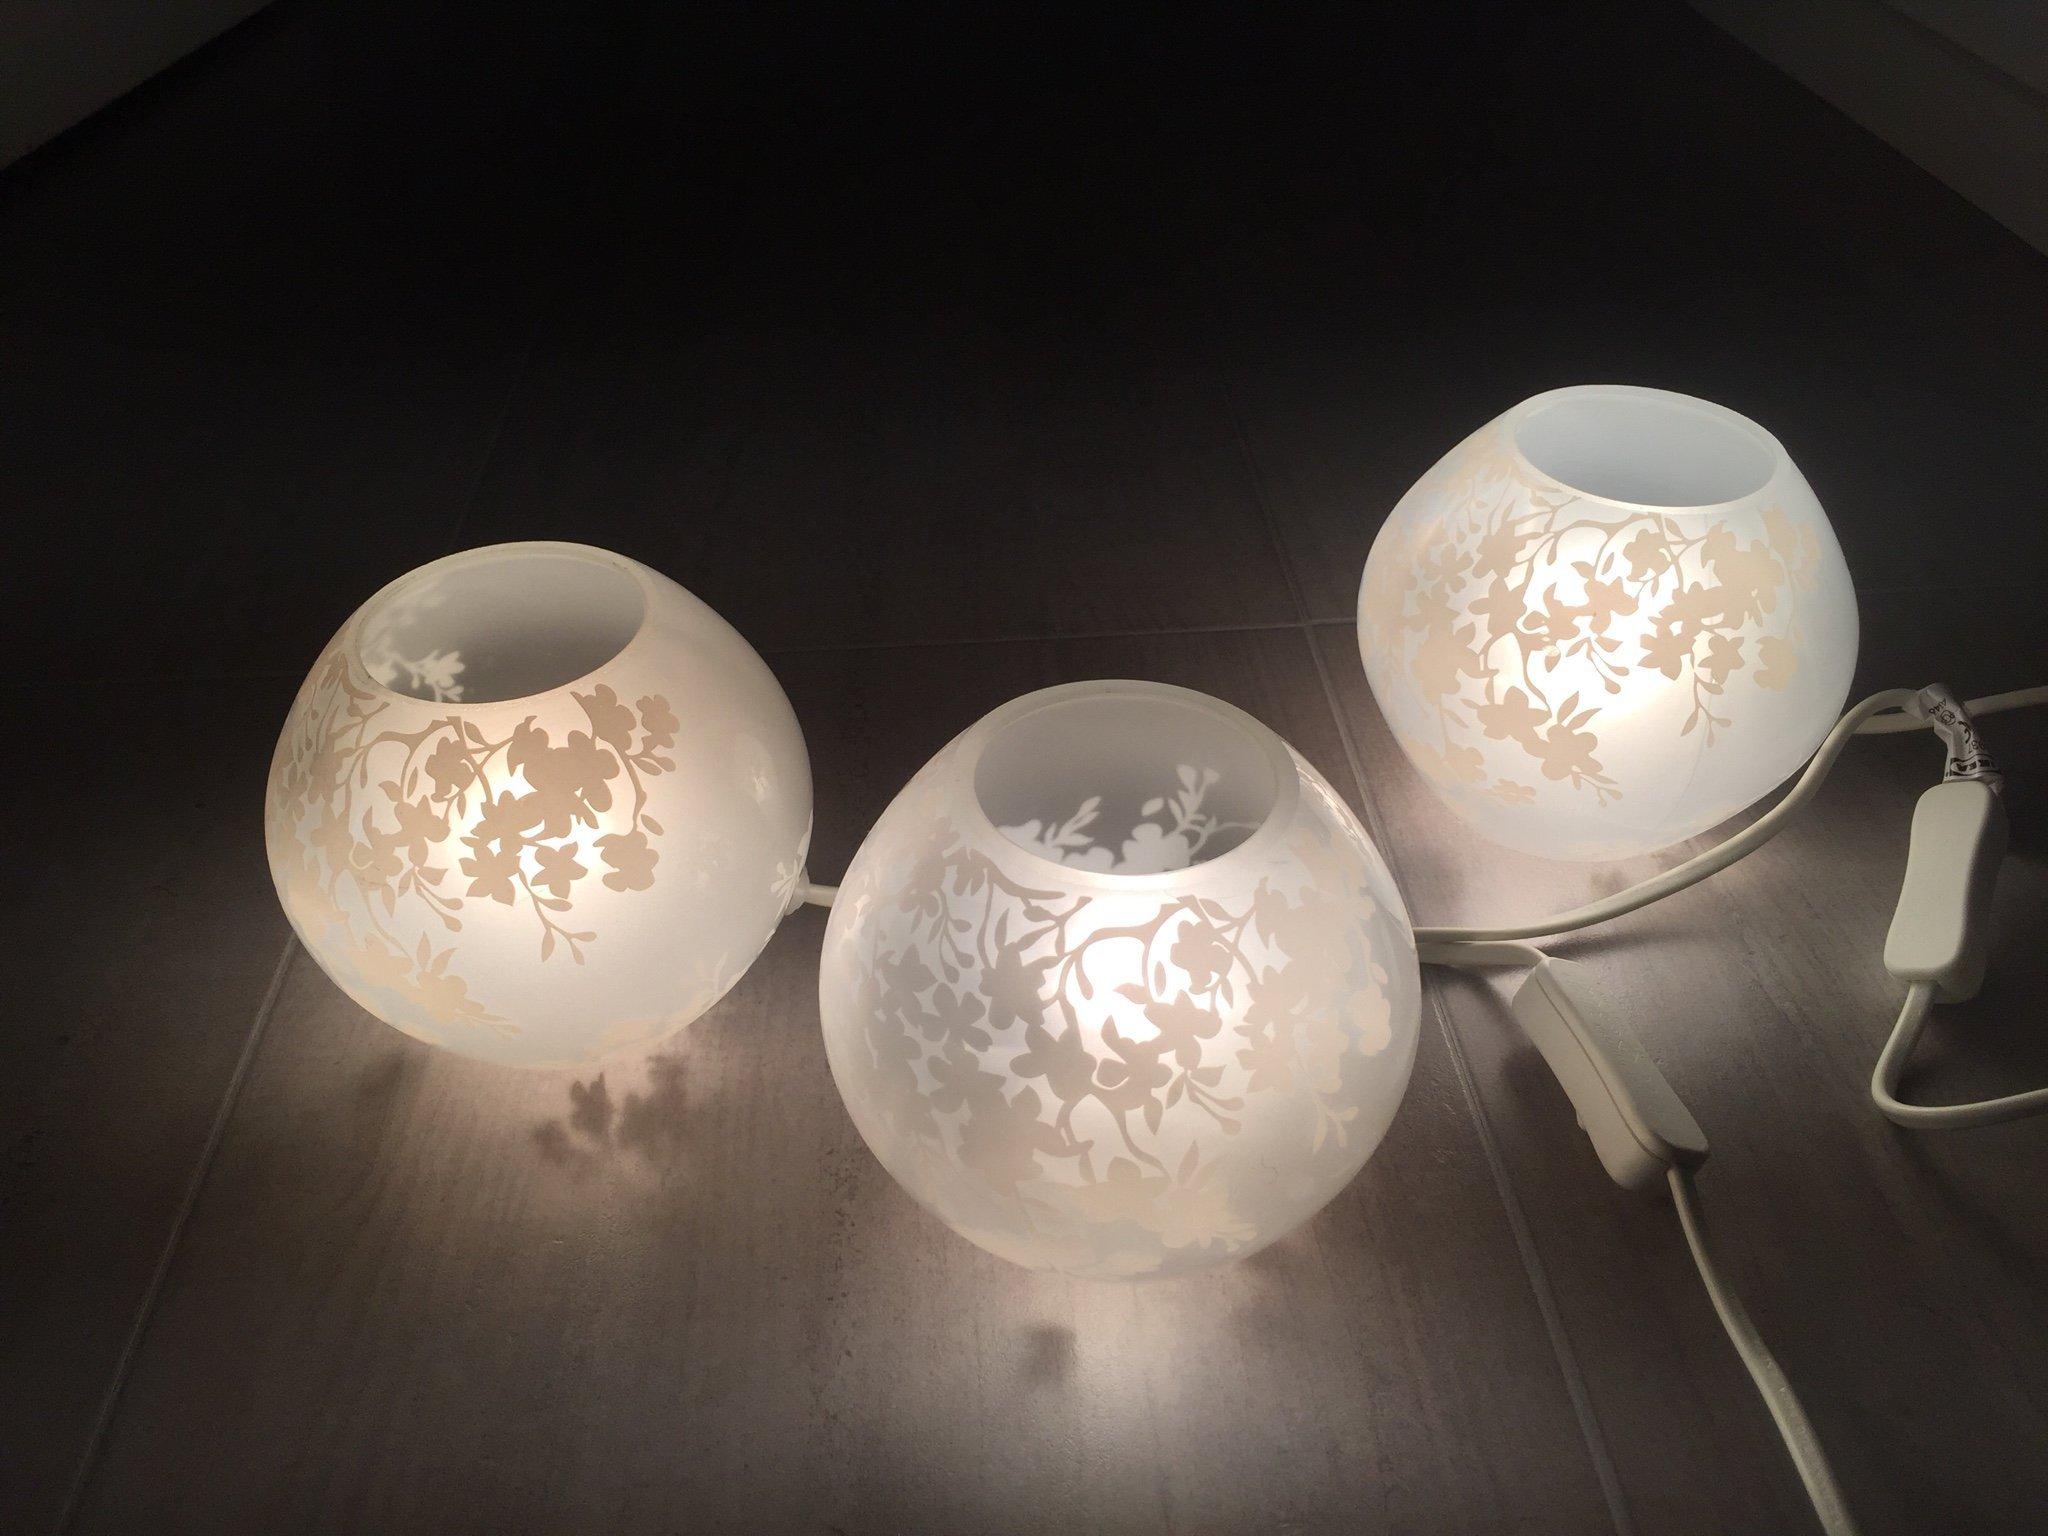 Underbar Ikea Knubbig - Tre bordslampor - tre små vita l.. (366513872) ᐈ NH-96